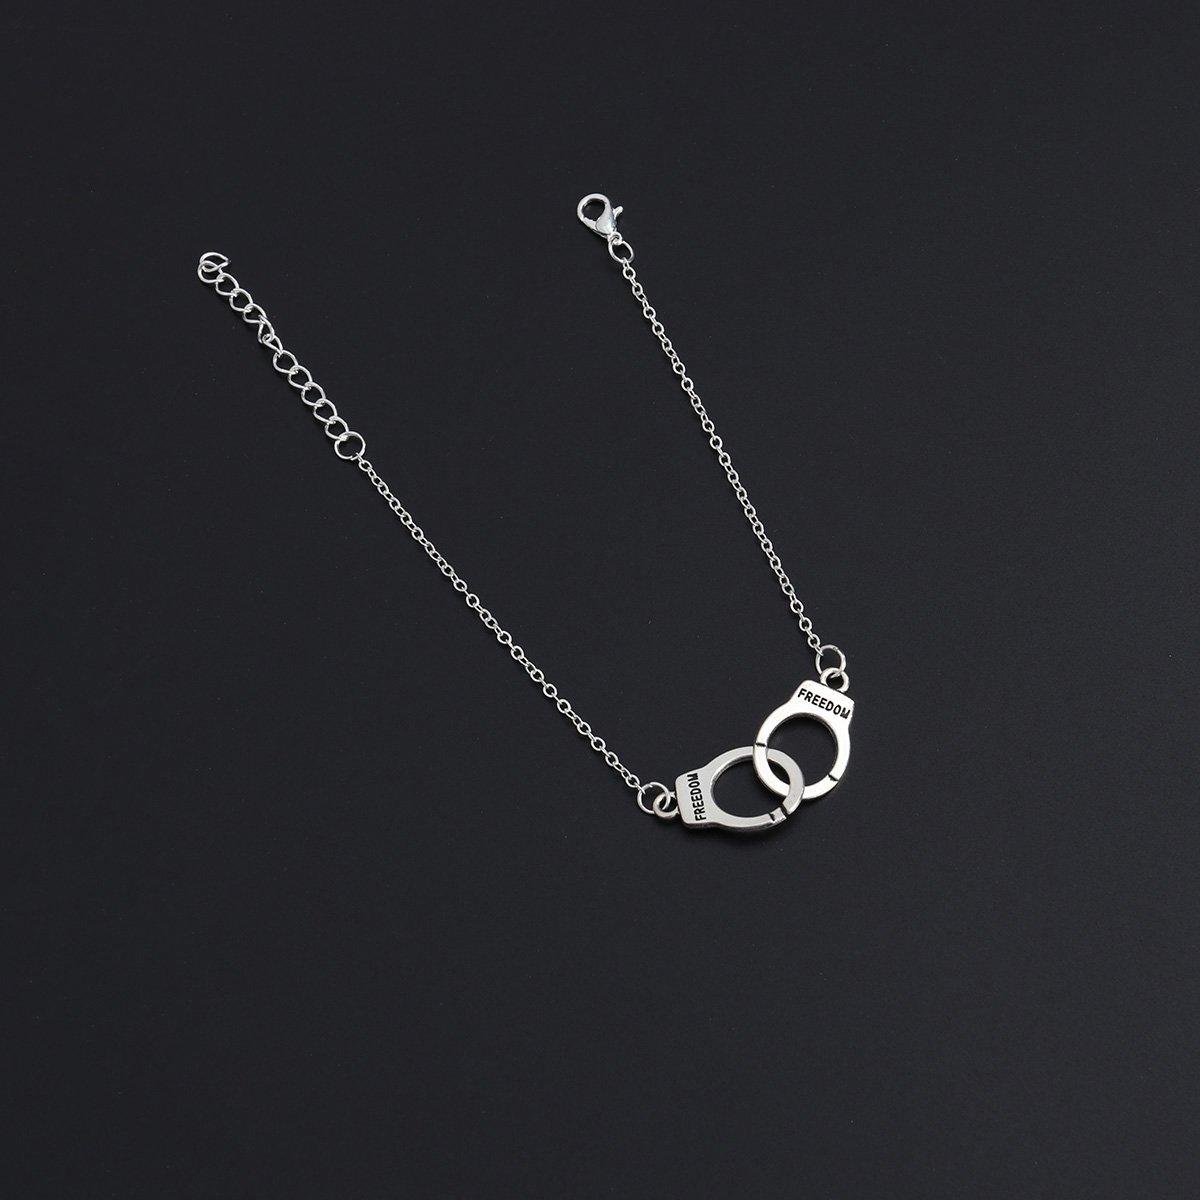 Foot Bracelet Jewelry Anklet Women Girls Ankle Leg Chain Charm Handcuff Bracelet Fashion Beach Jewelry Silver